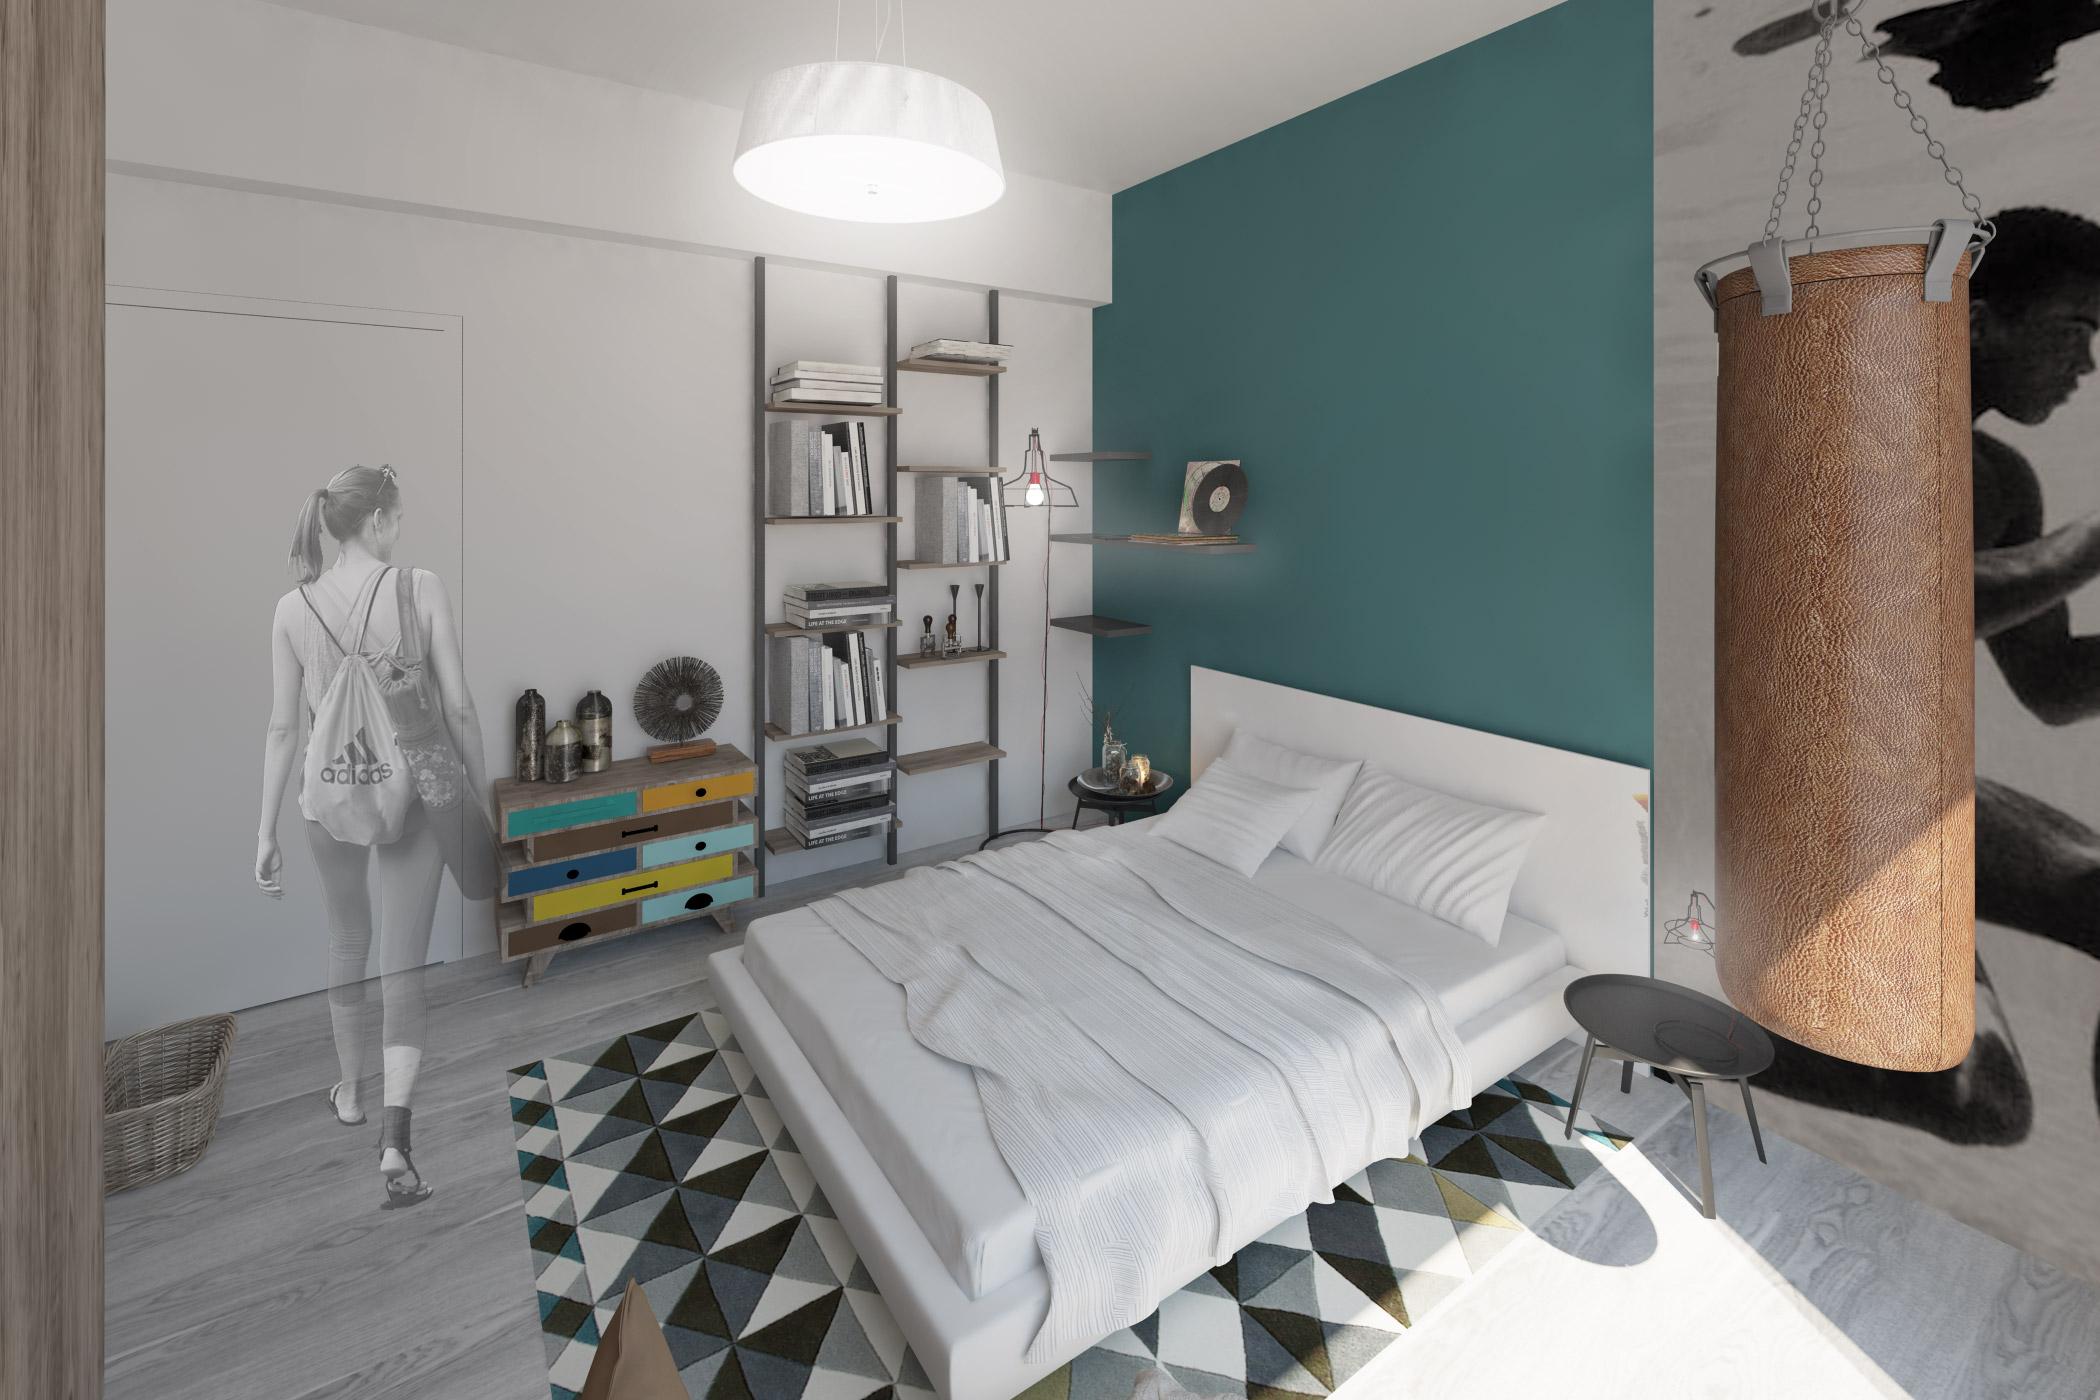 reflex-architecture_amenajare-interioara-apartament-003